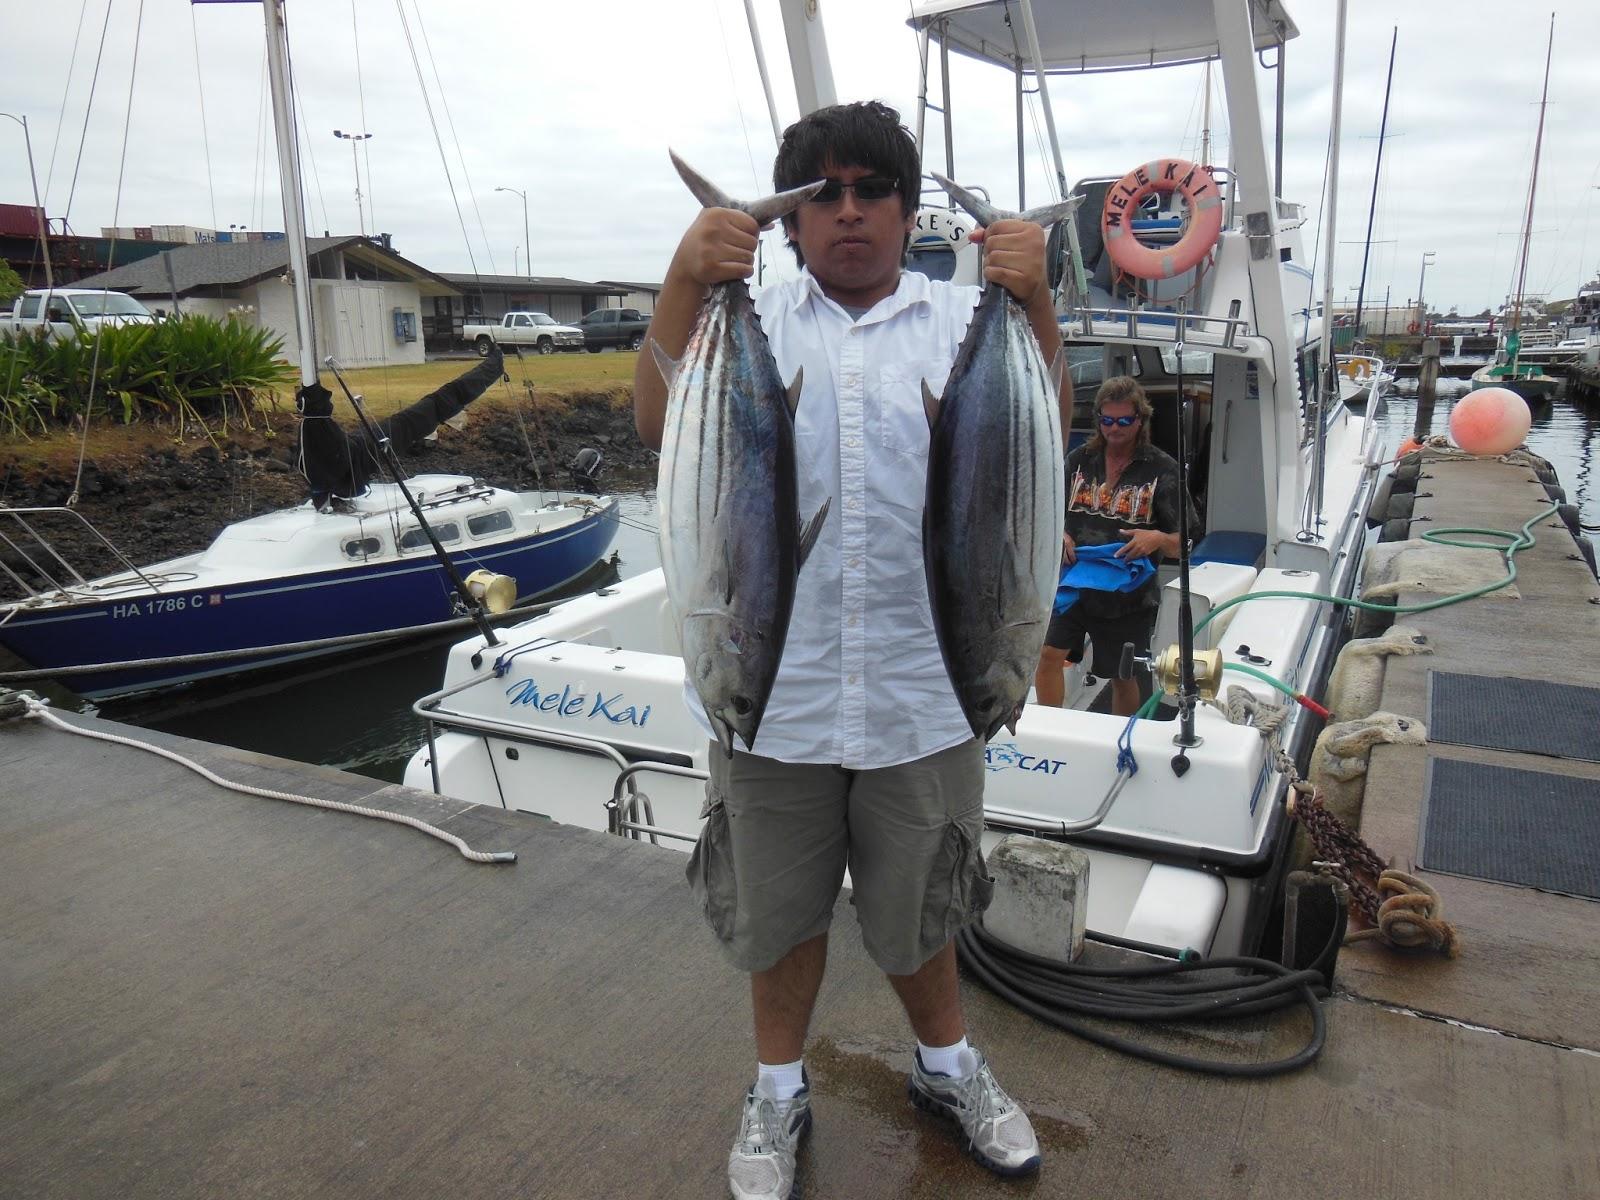 C lure fishing chaters kauai hawaii fishing report hawaii for Kauai fishing report